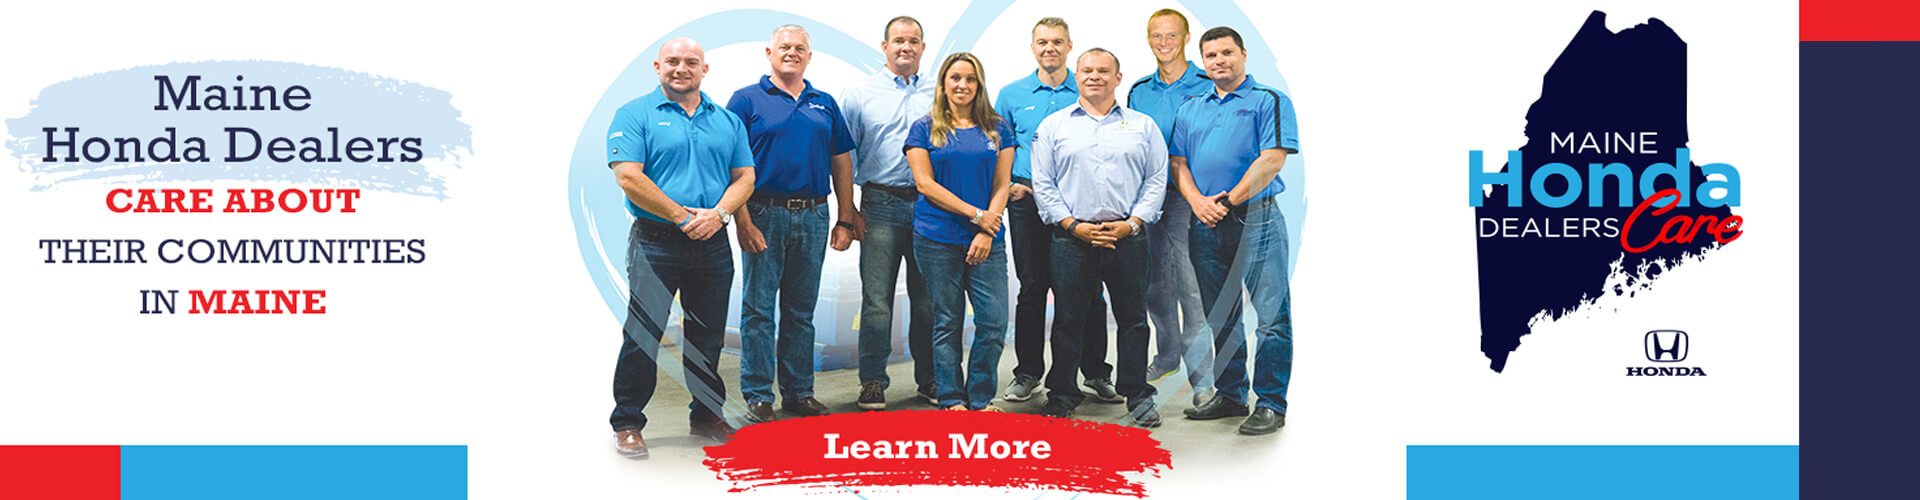 Honda Dealership Group in Maine, serving Portland and Bangor Drivers